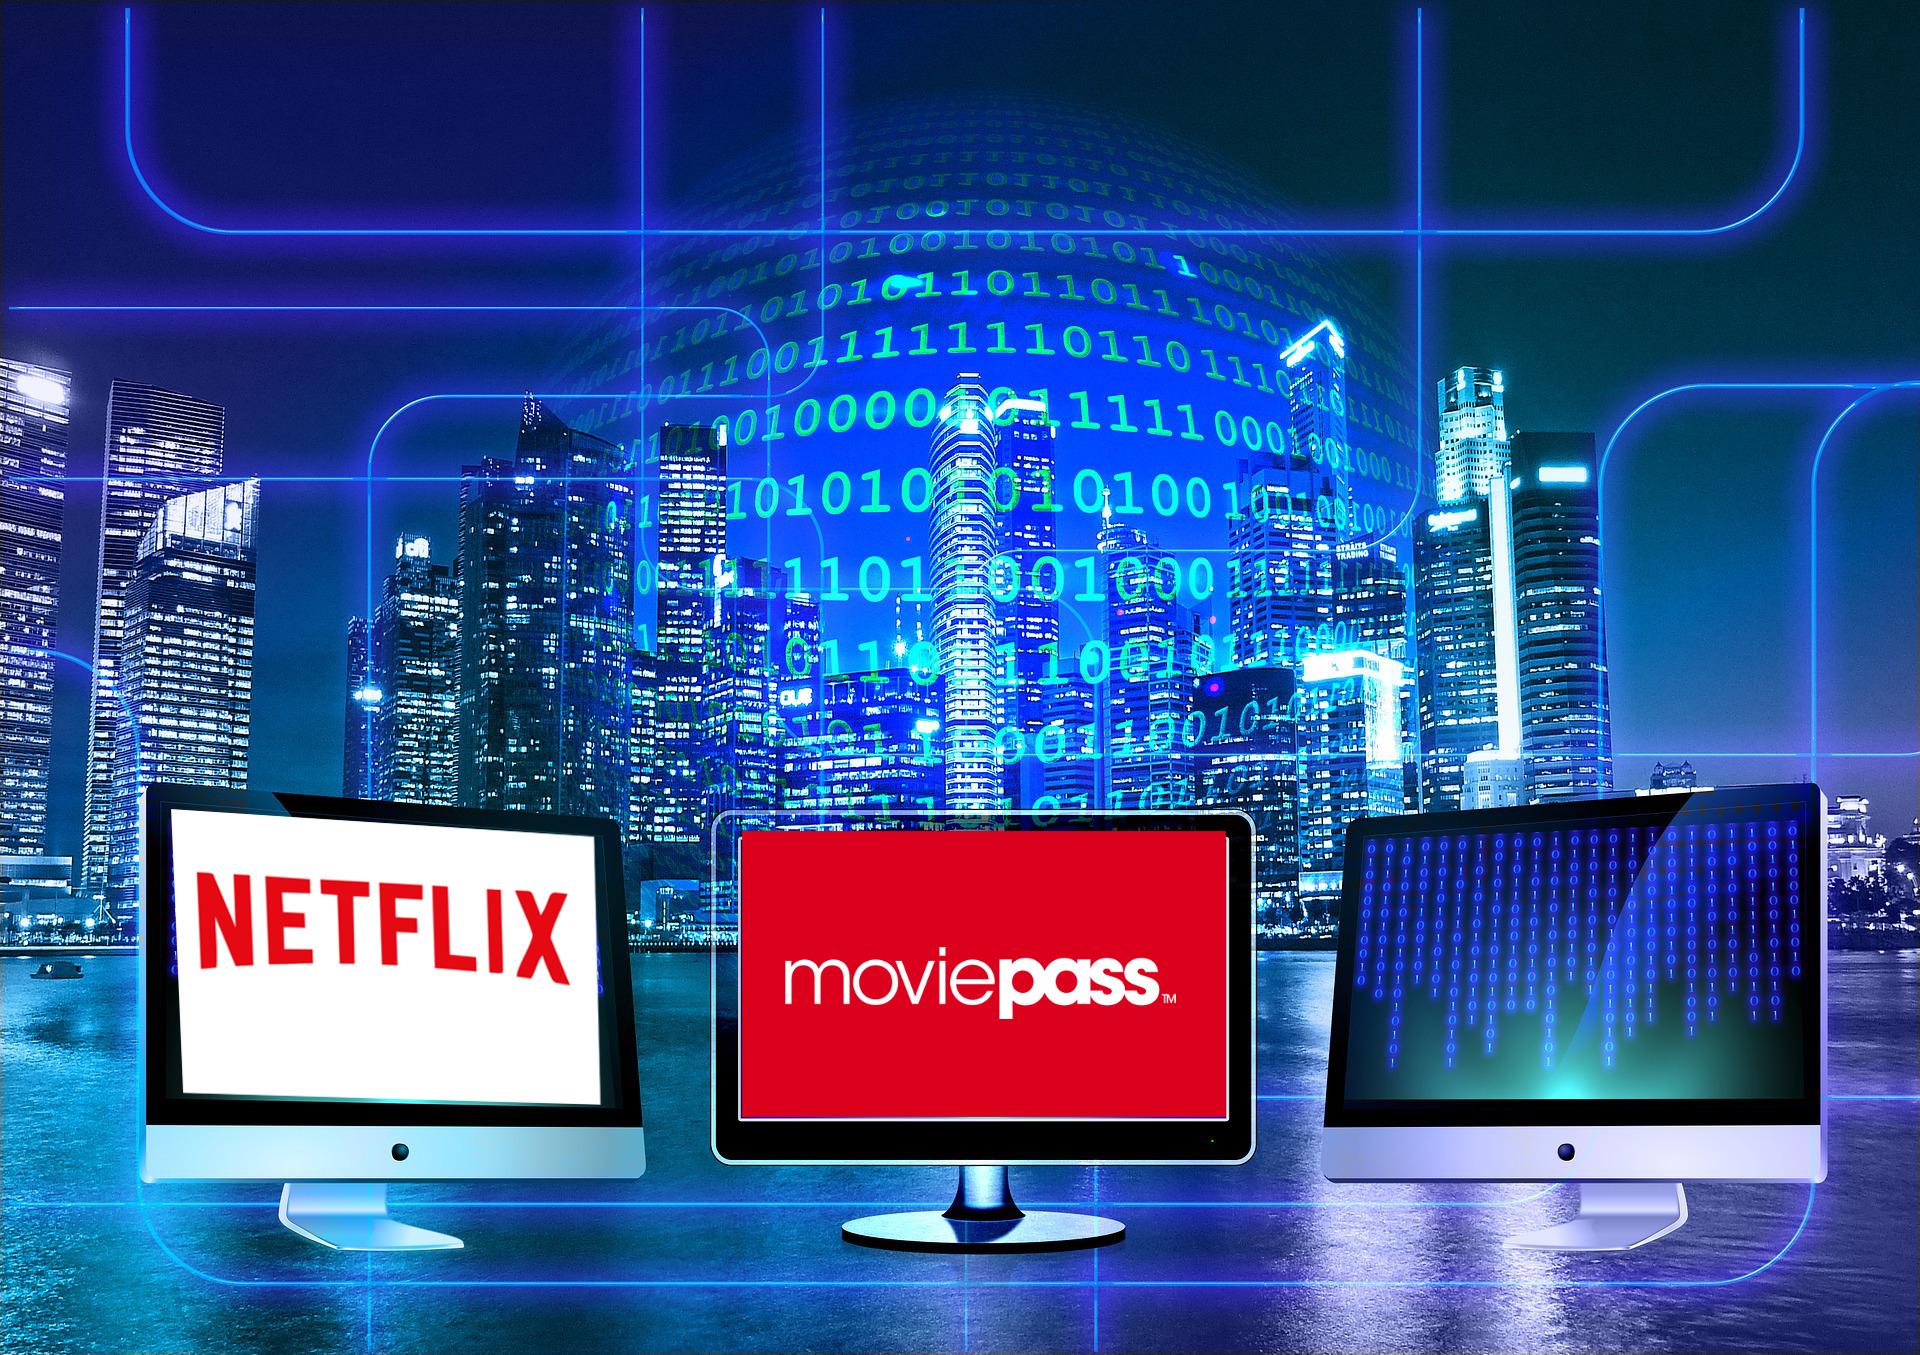 moviepass-netflix-business